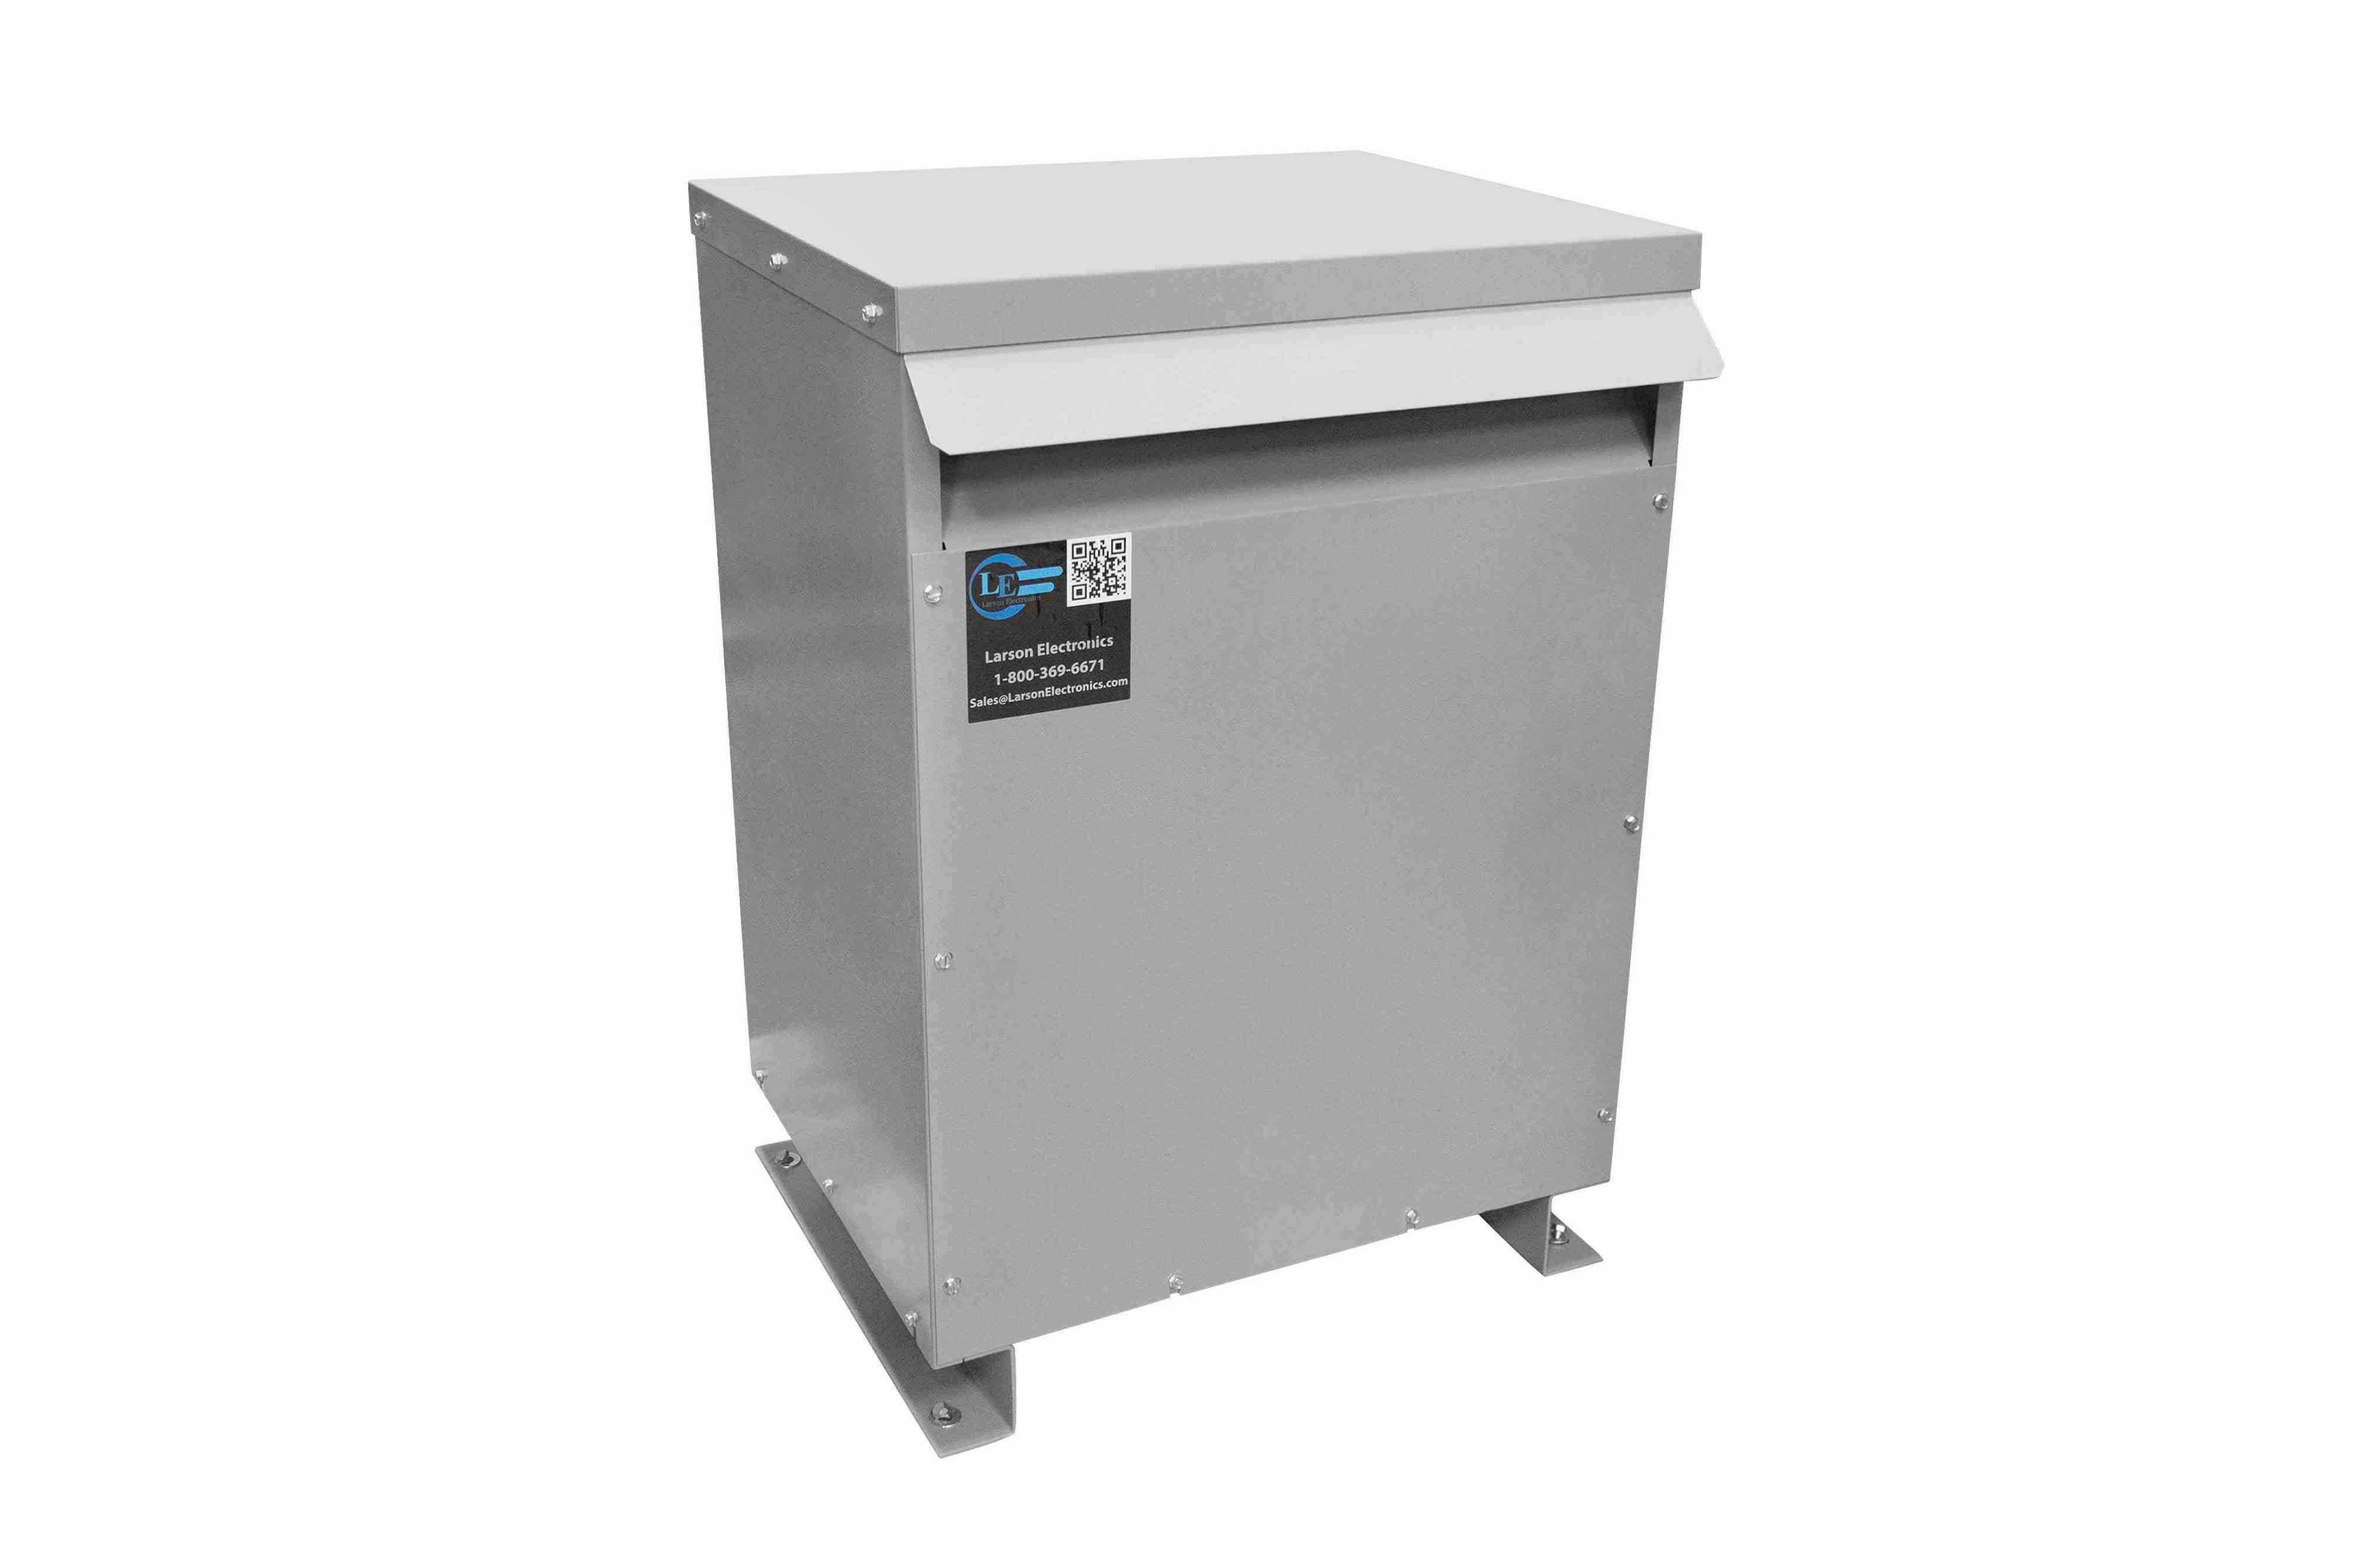 200 kVA 3PH Isolation Transformer, 415V Wye Primary, 600Y/347 Wye-N Secondary, N3R, Ventilated, 60 Hz